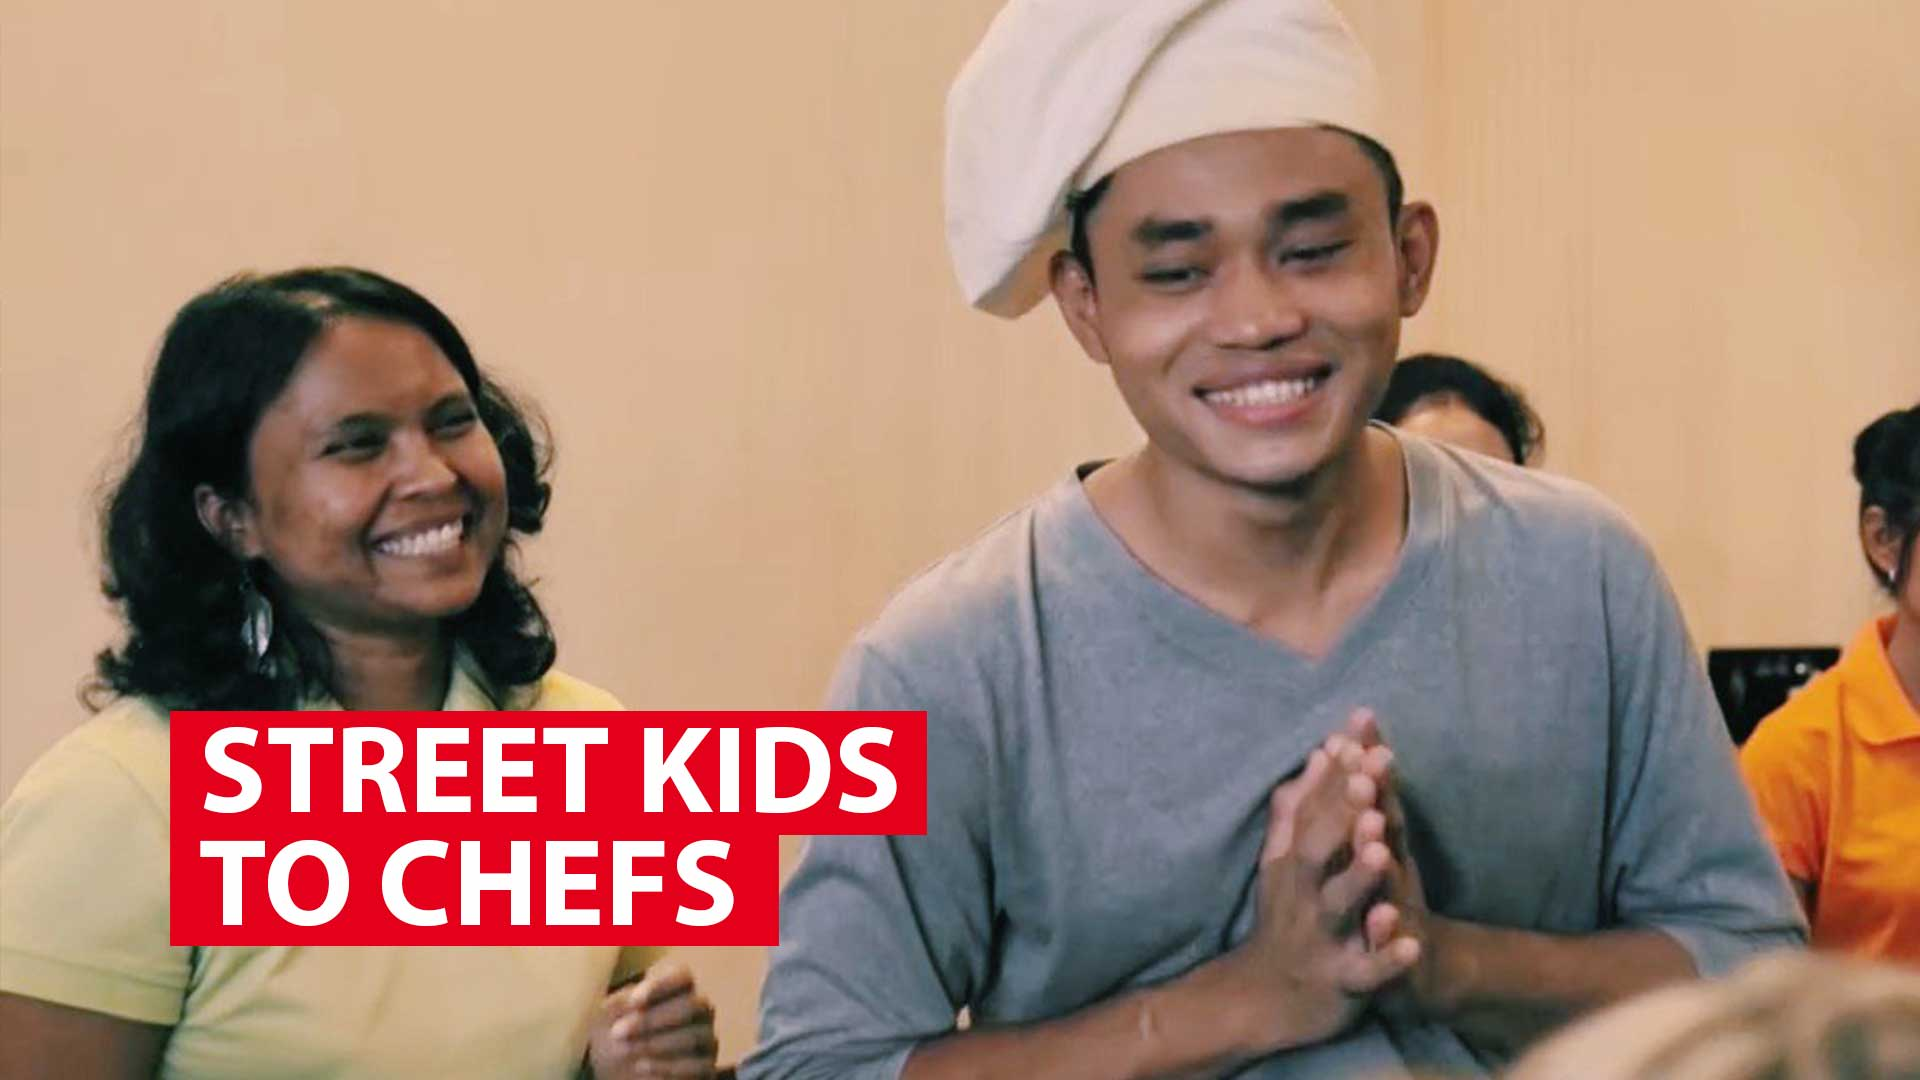 Street kids to chefs